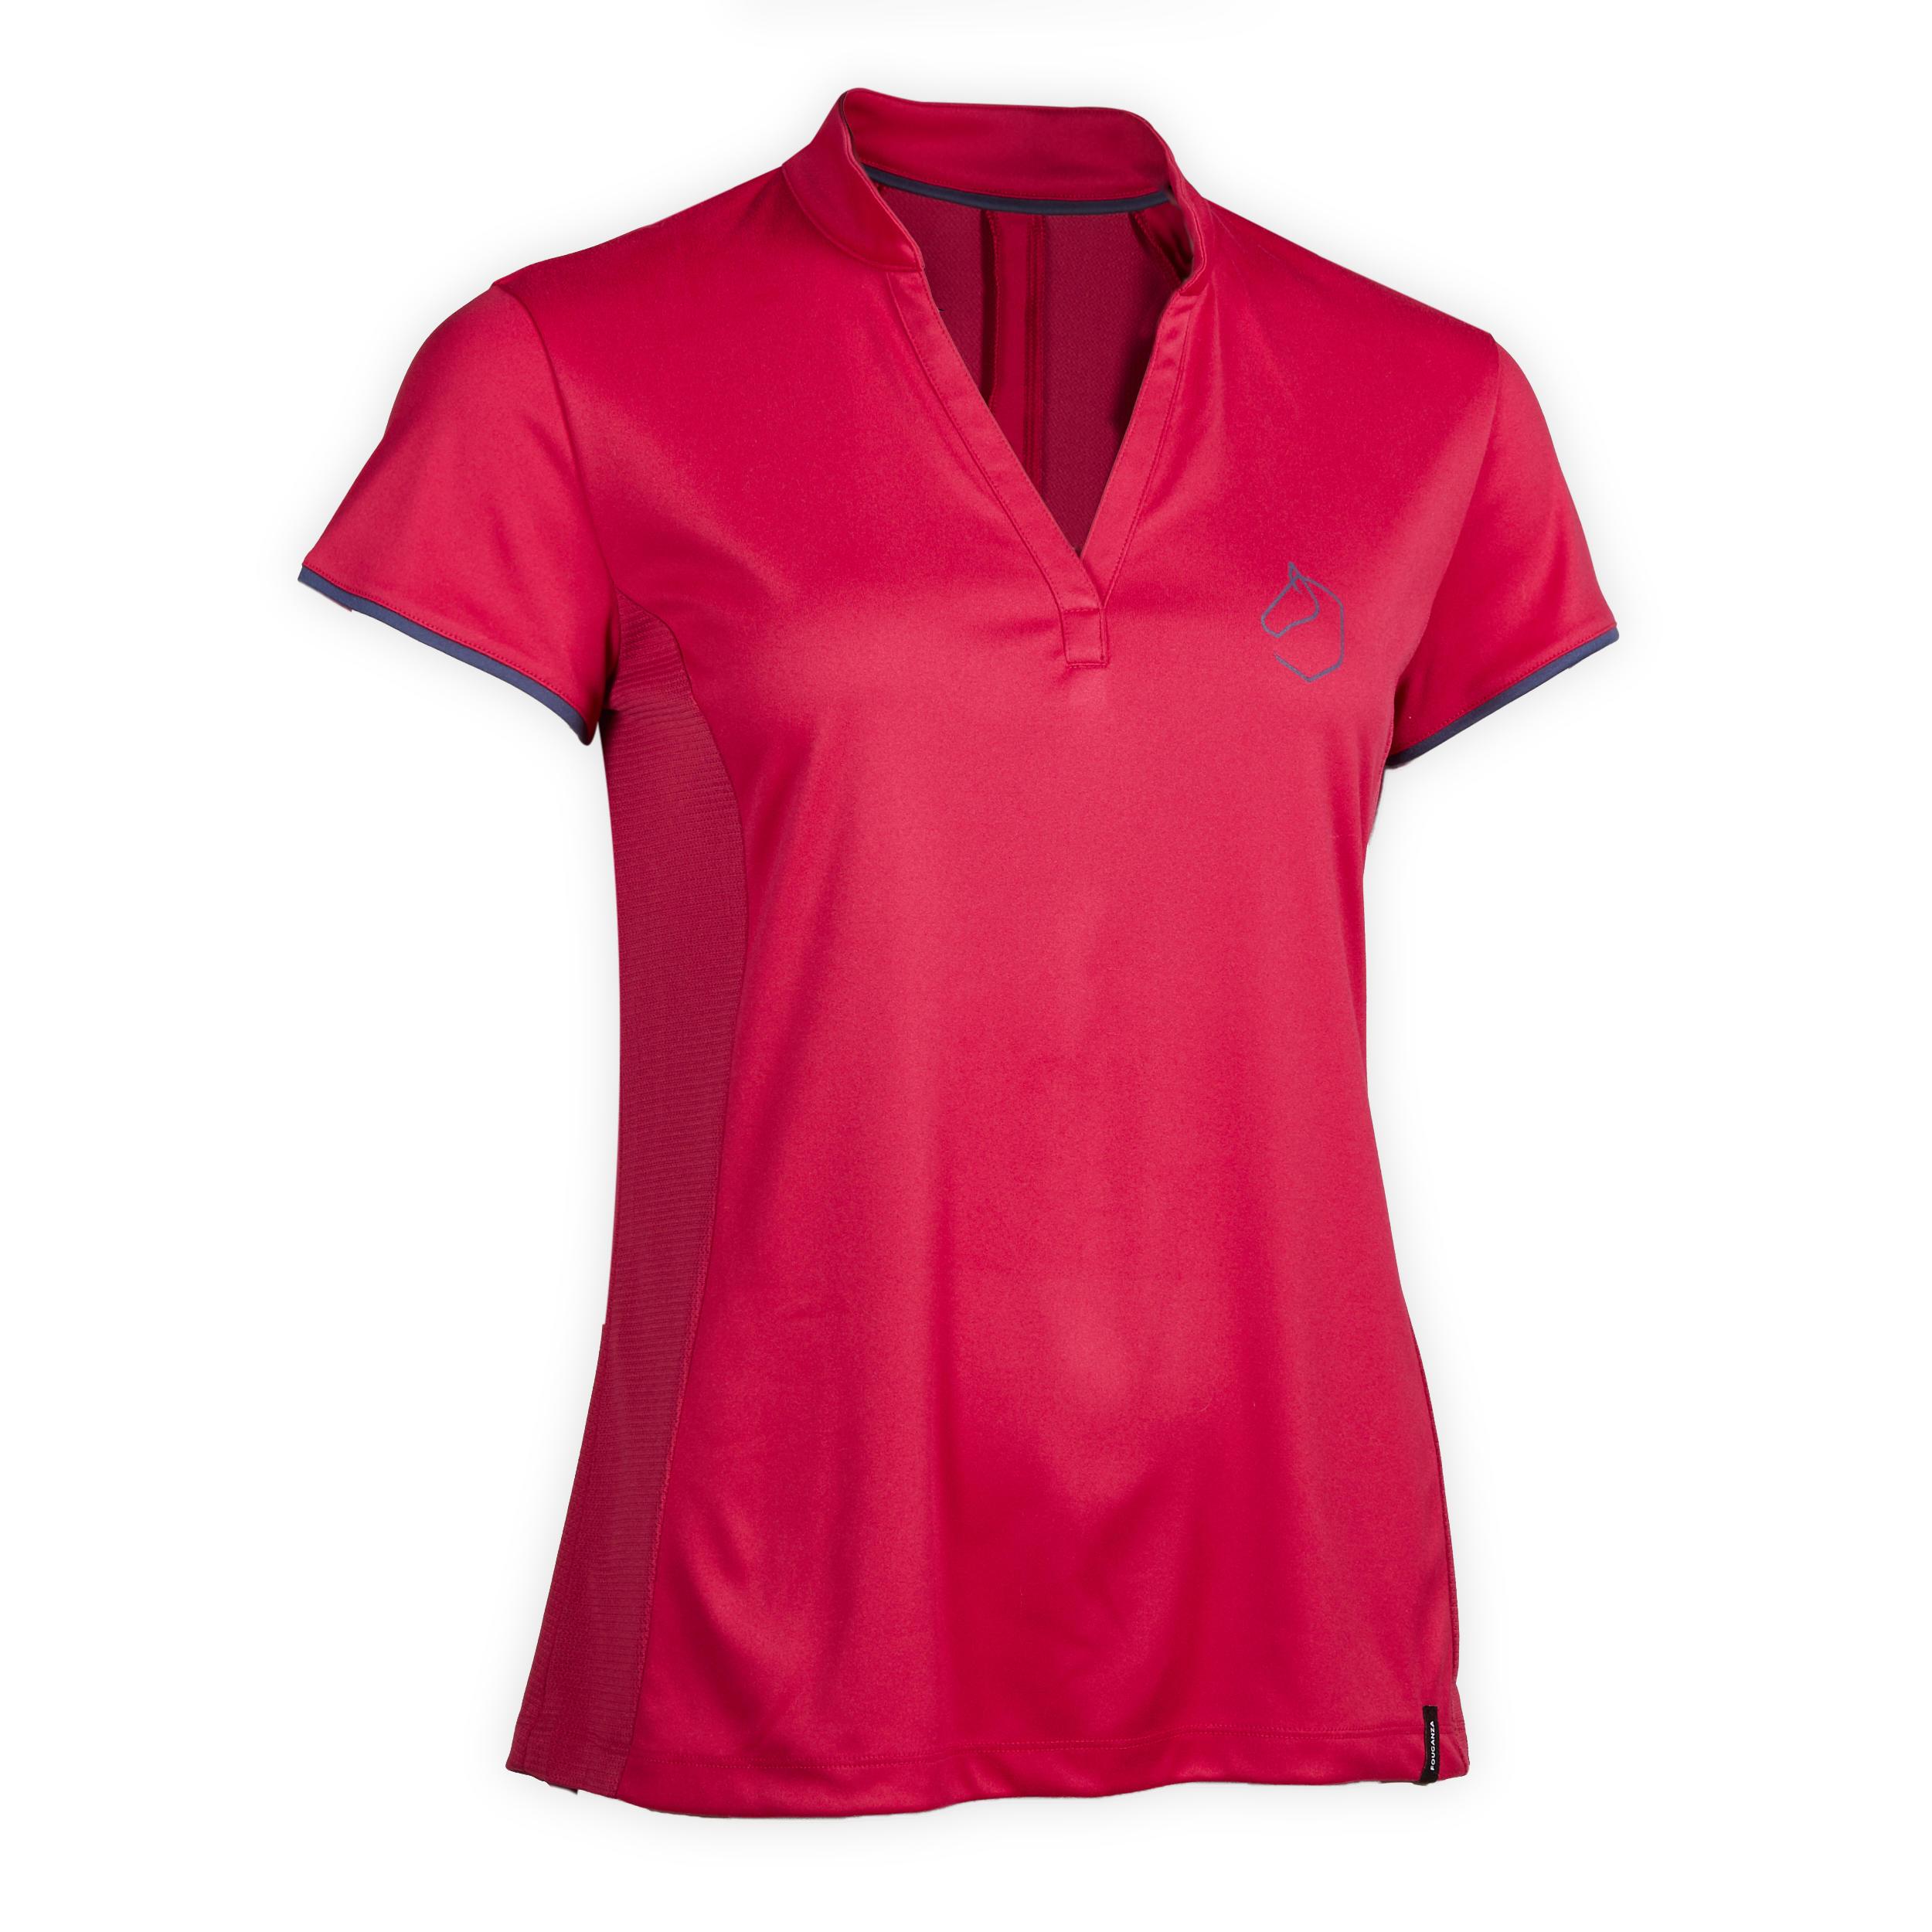 Tricou Polo 500 MESH roz Damă